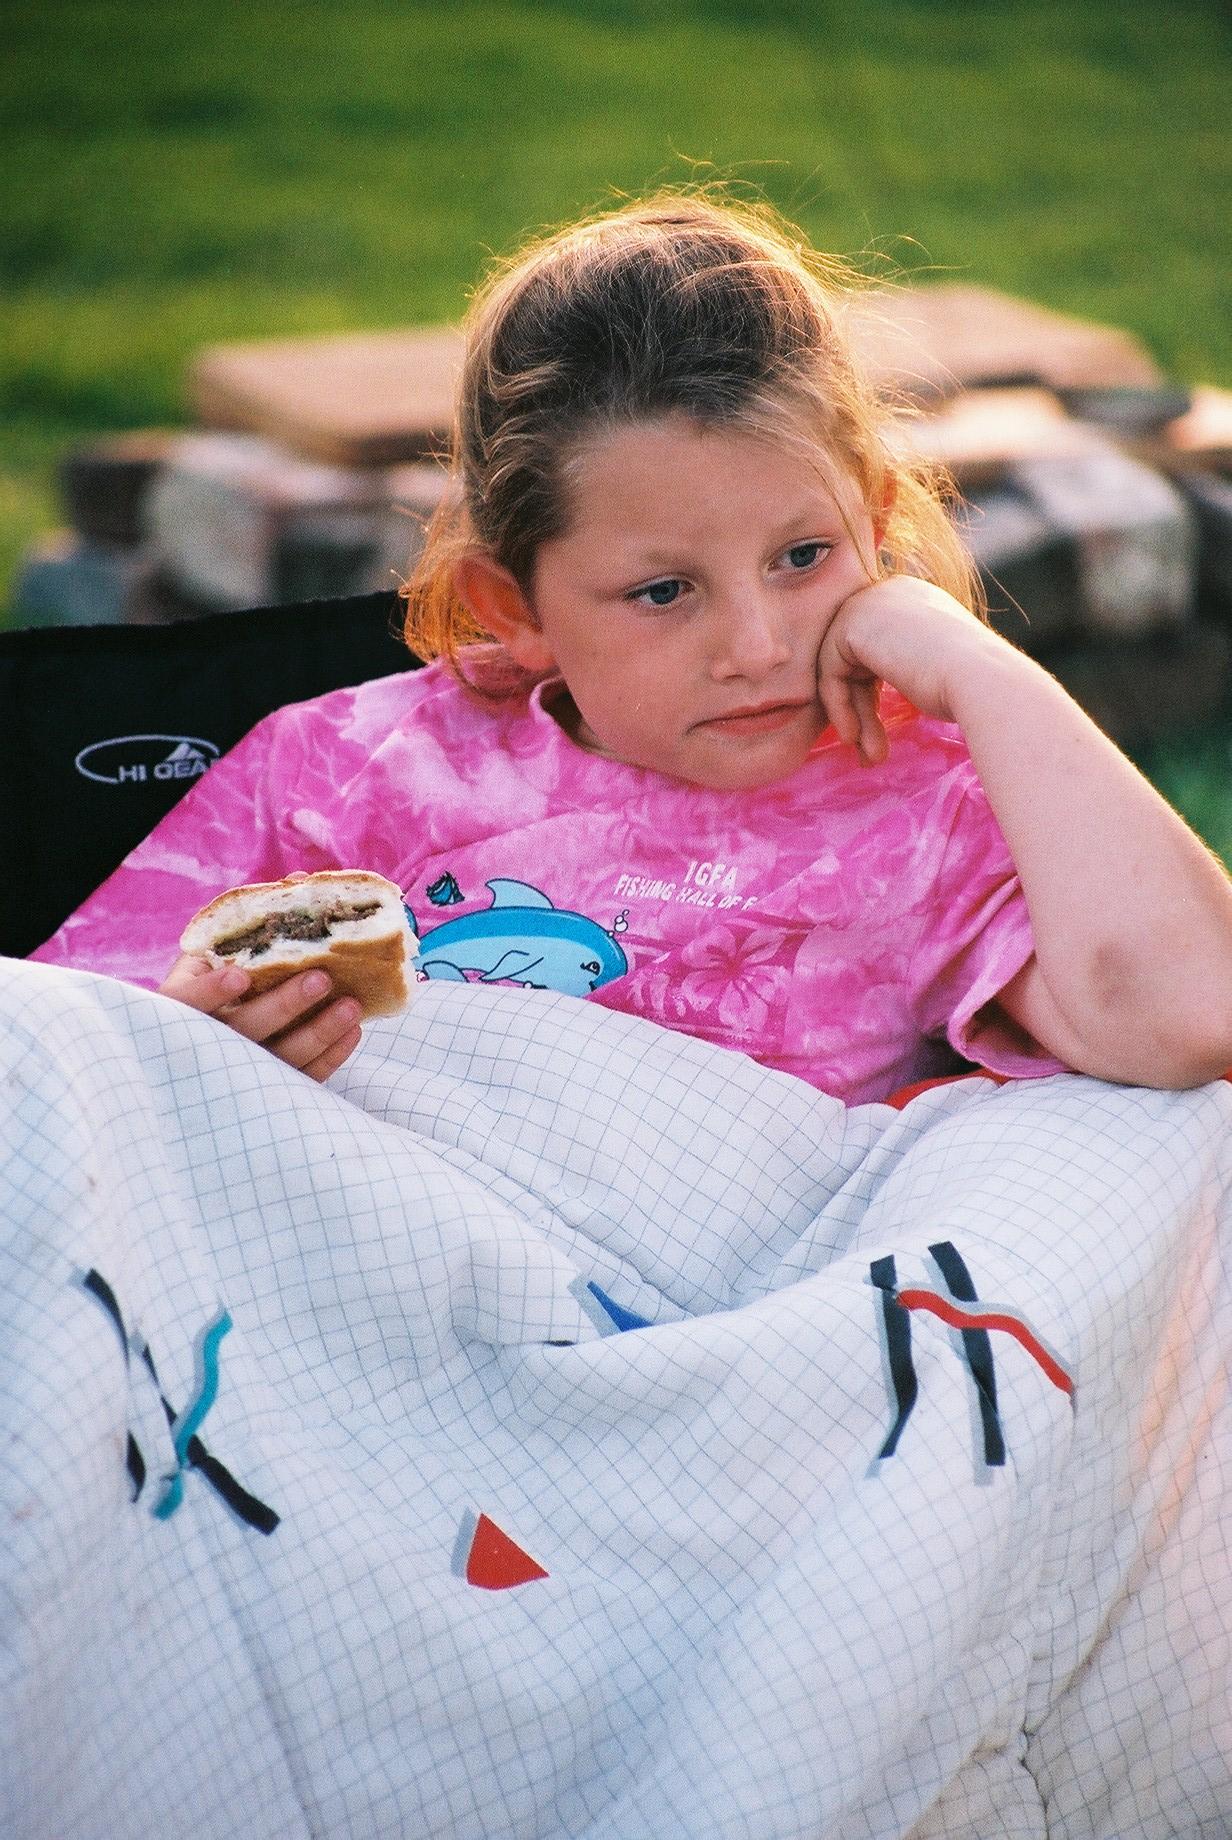 Girl at Barbecue.JPG